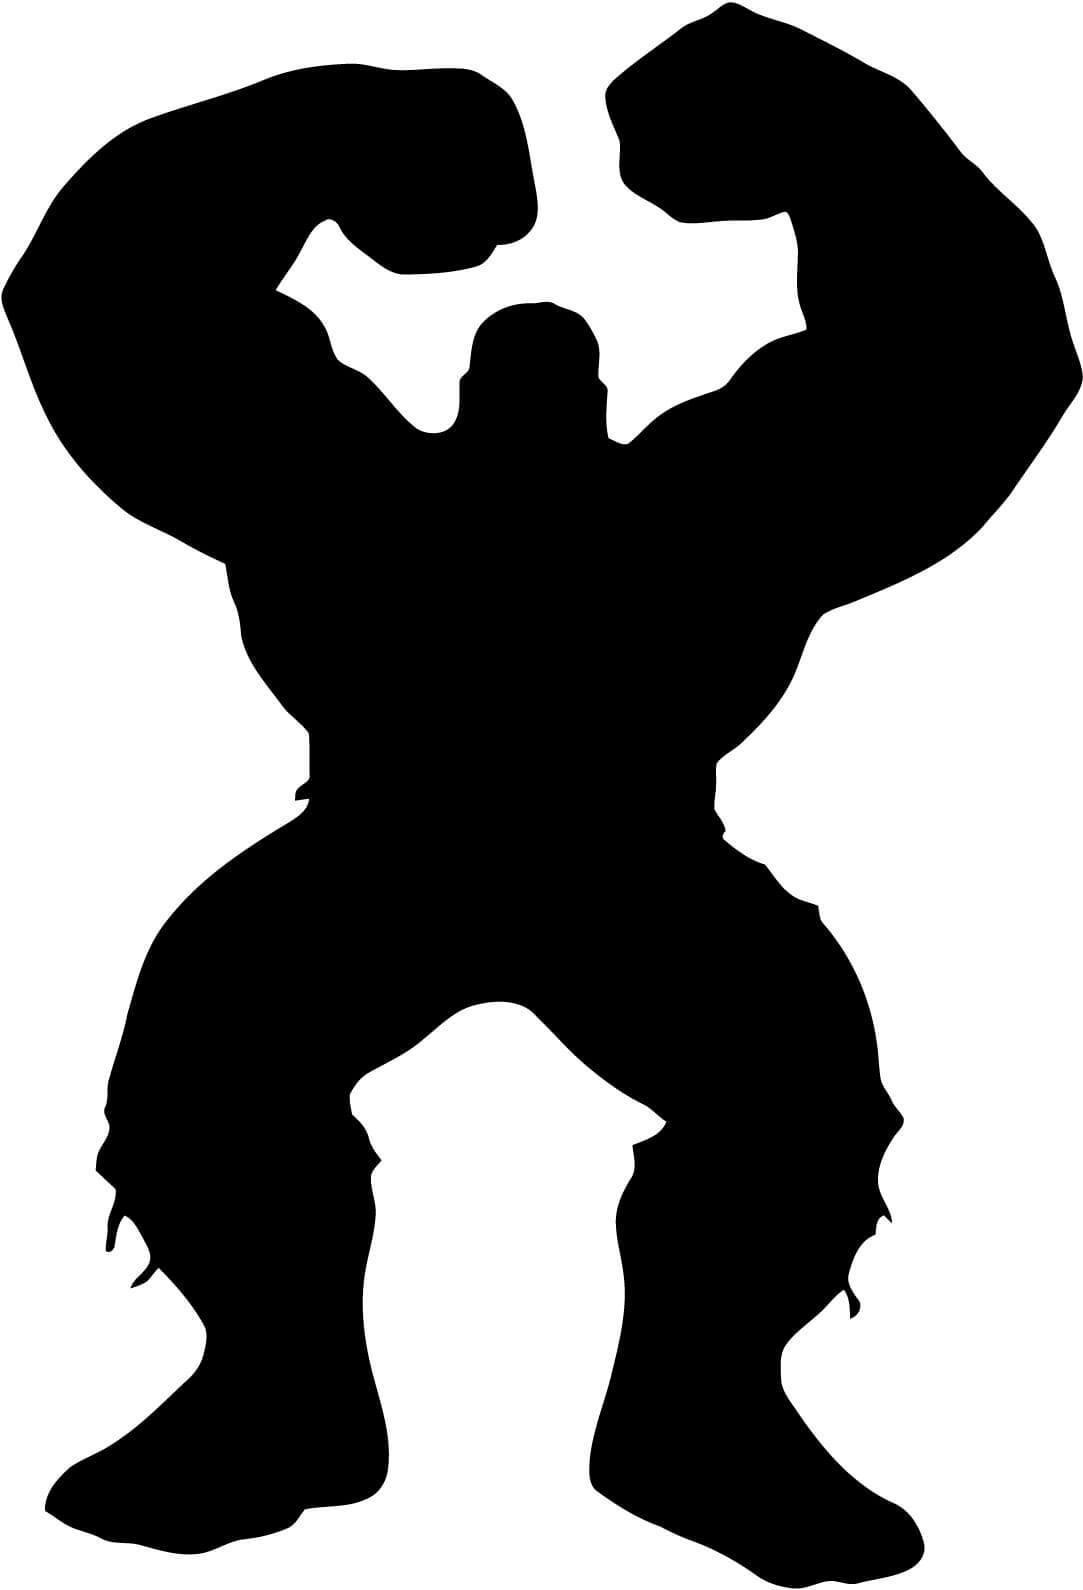 1083x1590 Hulk Full Body Silhouette Smash